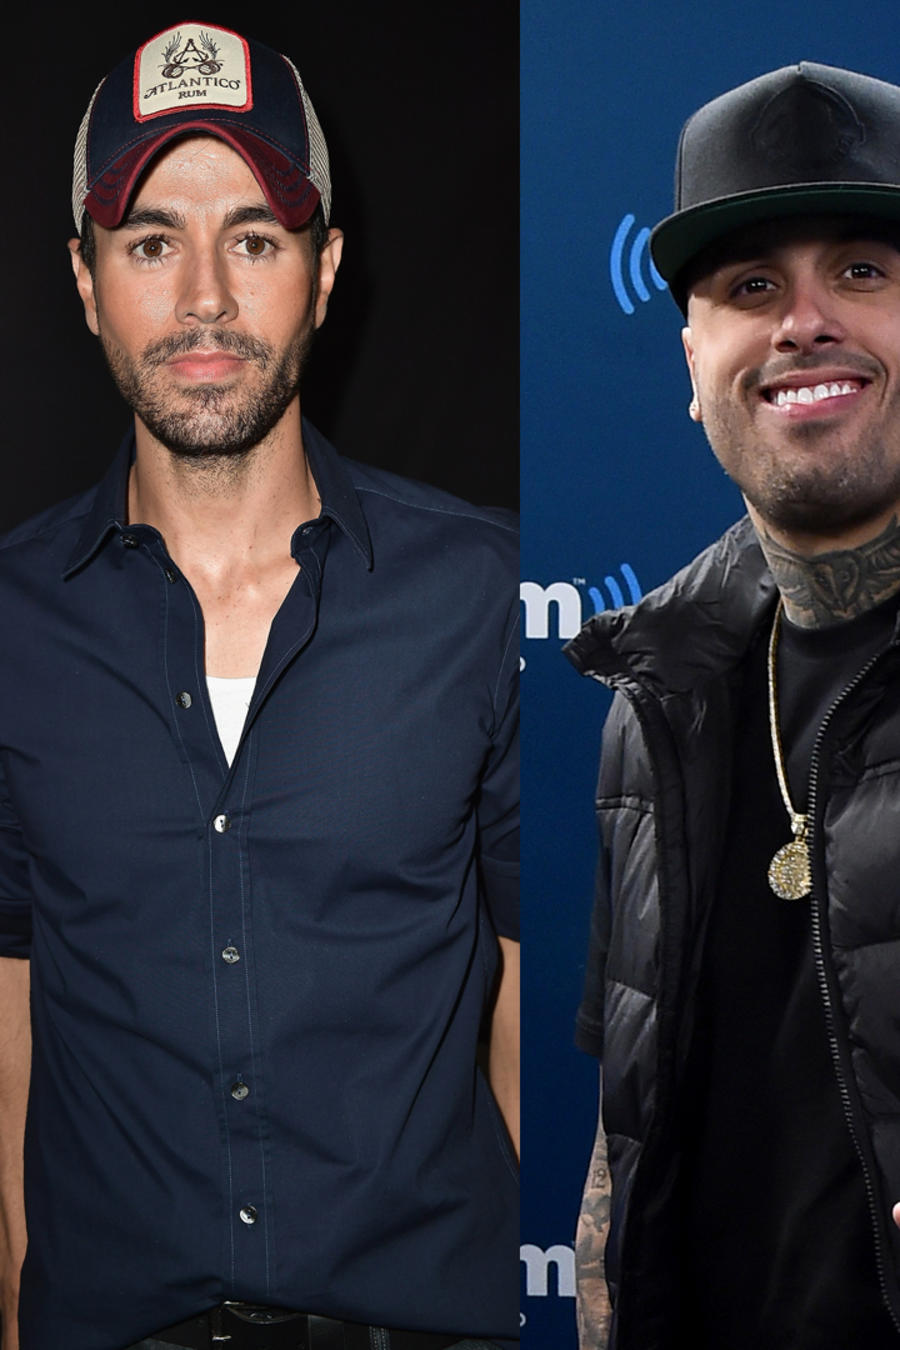 Enrique Iglesias, Nicky Jam, J Balvin, Prince Royce